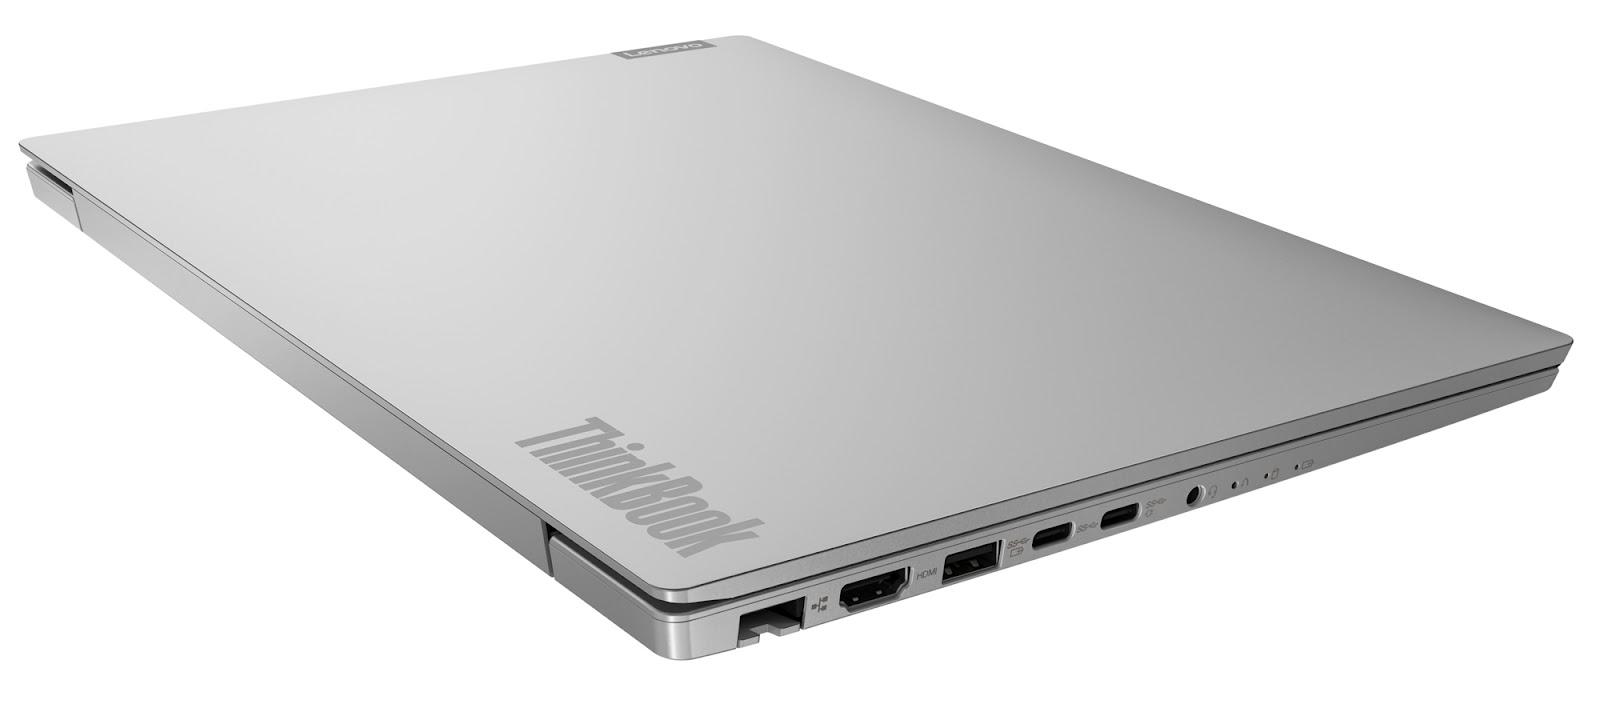 Фото 3. Ноутбук Lenovo ThinkBook 14 IIL (20SL00F2RU)